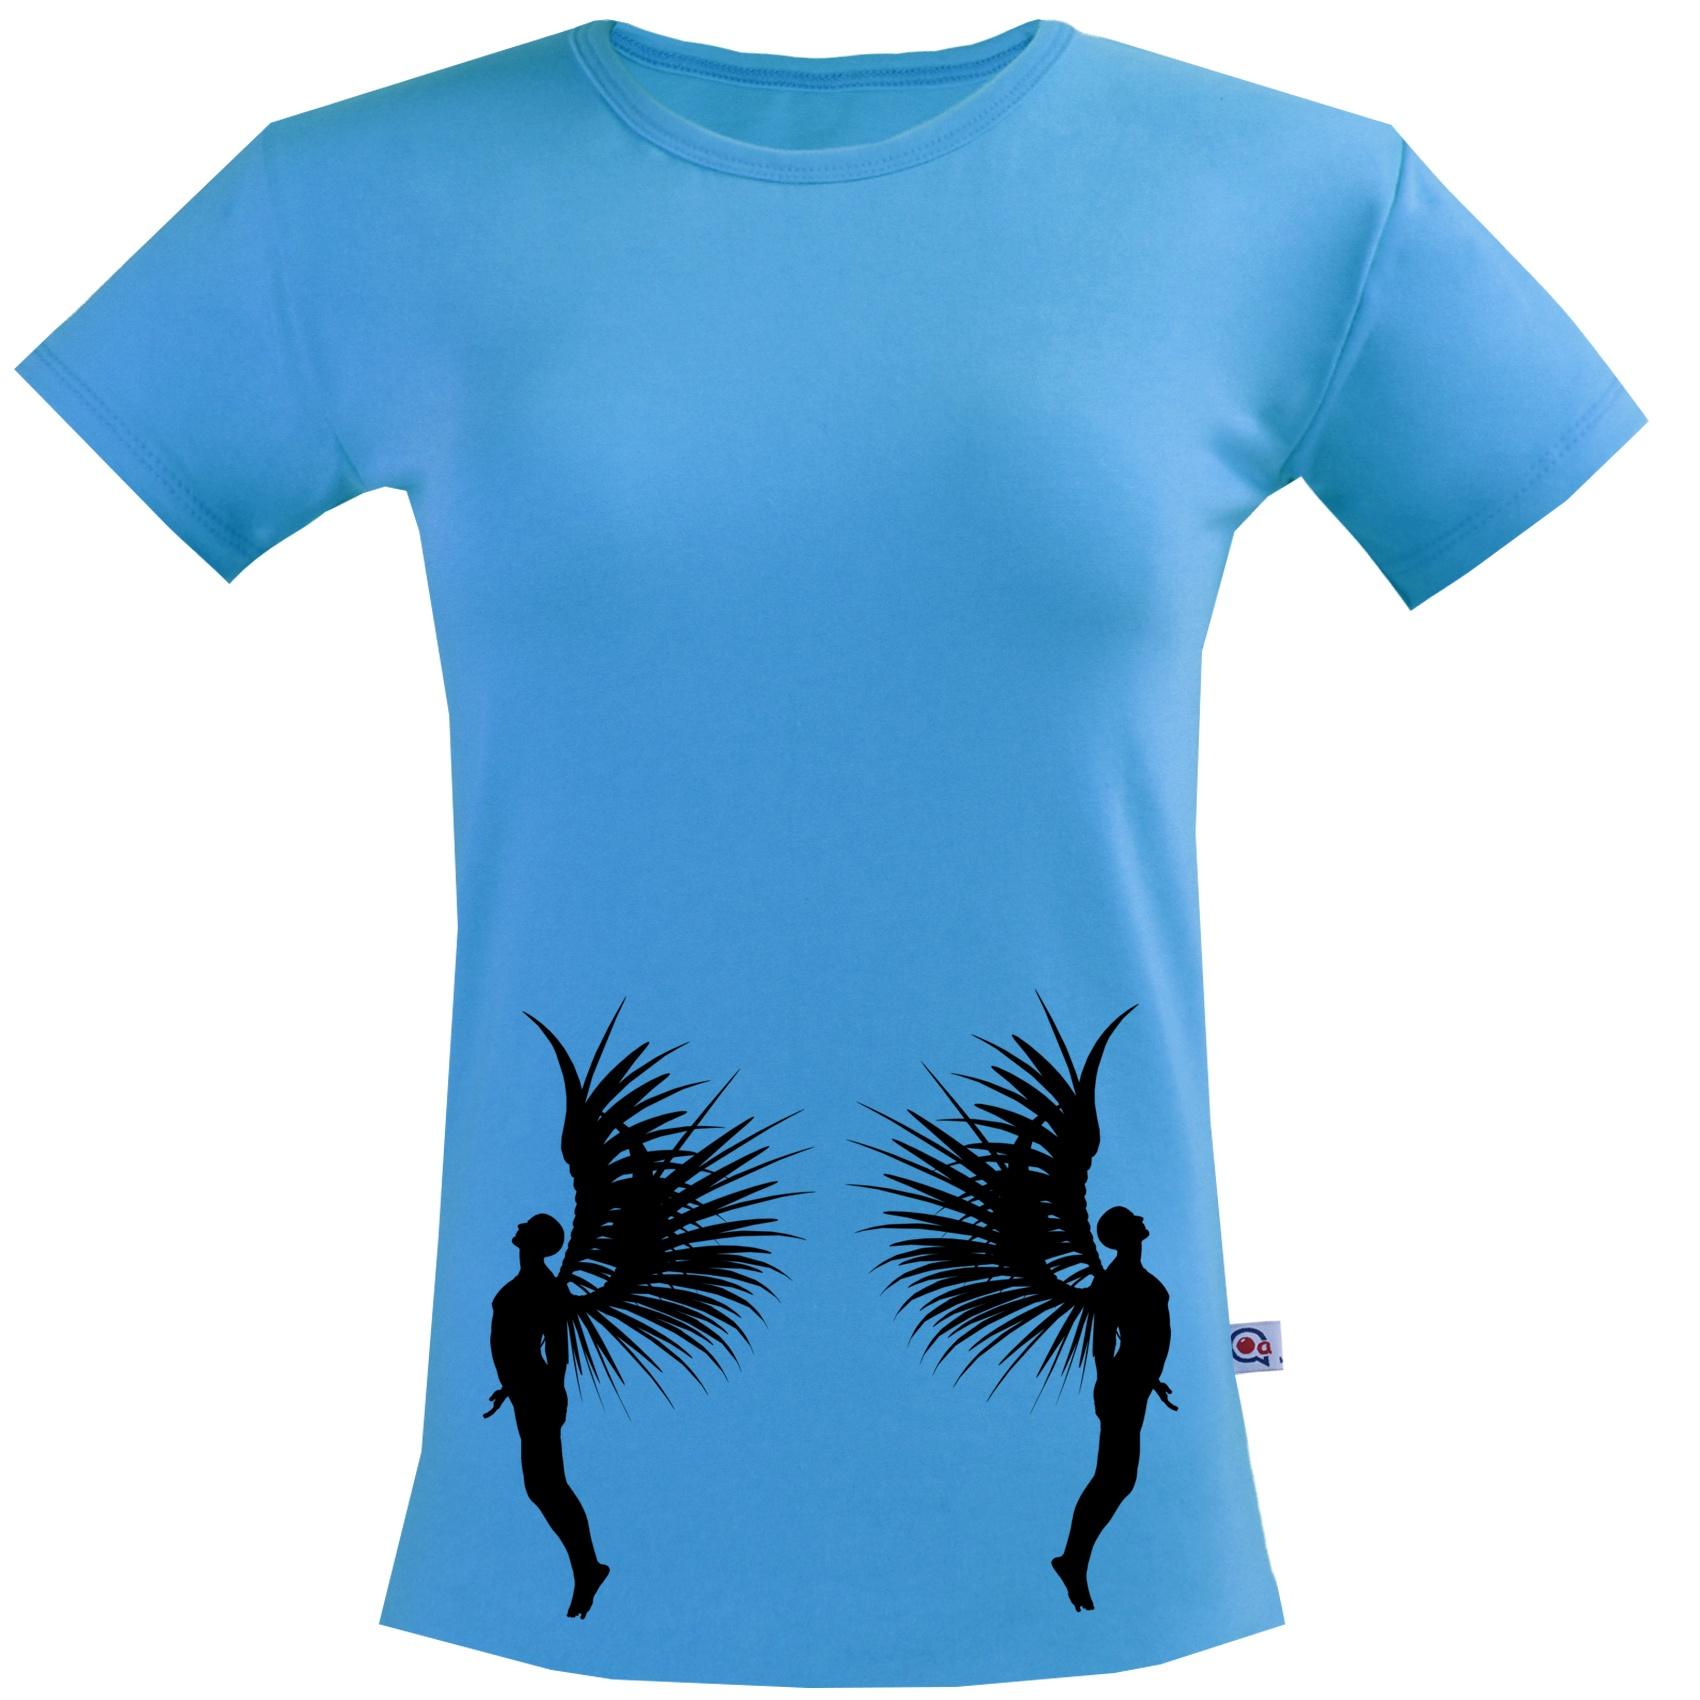 تیشرت آستین کوتاه مردانه آکو طرح angel کد Na036